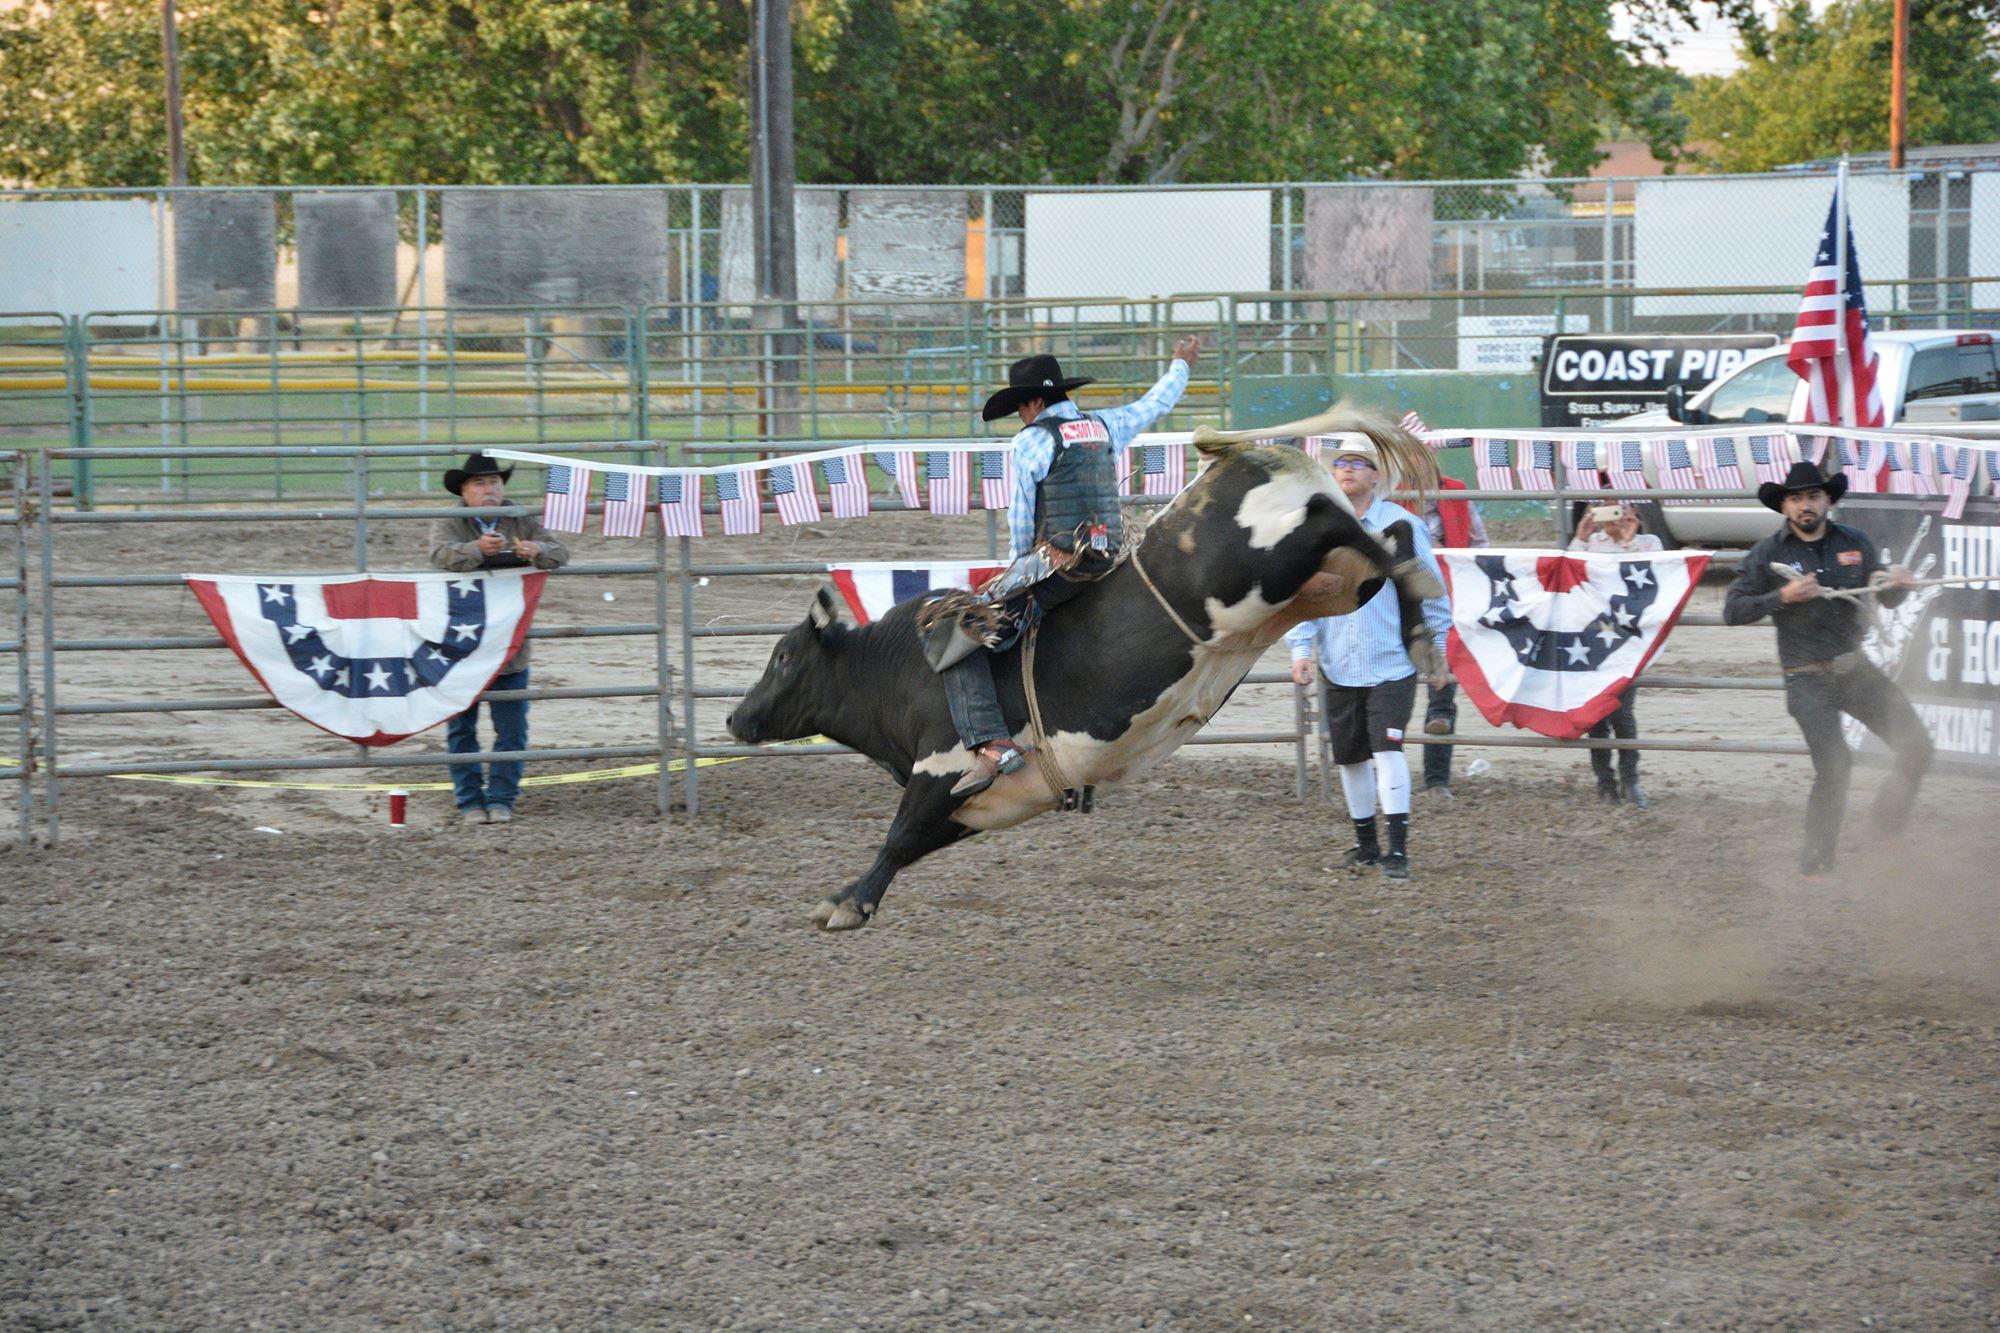 Bull rider holding on